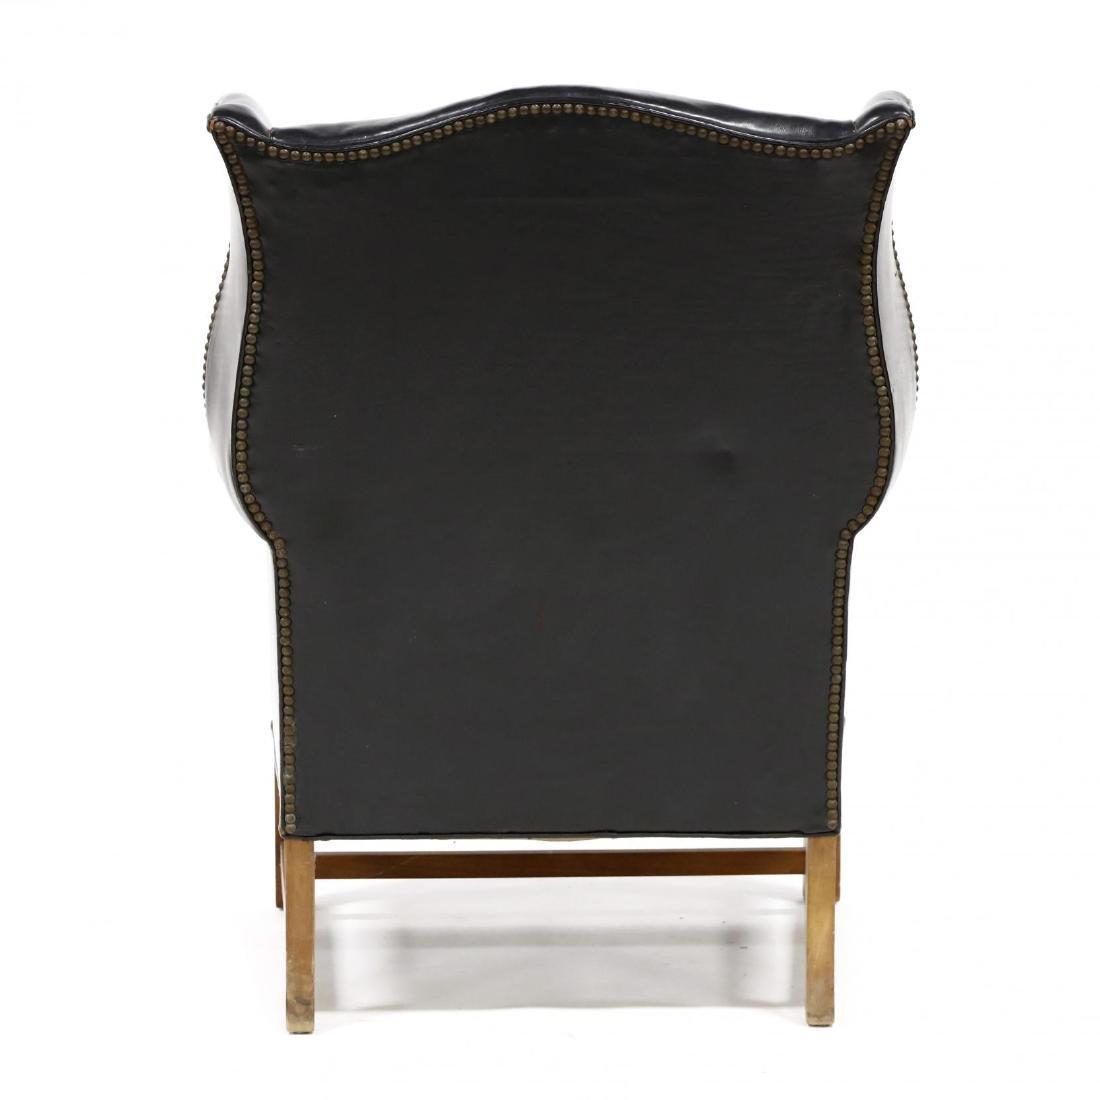 Century Furniture, Vintage Leather Upholstered - 4